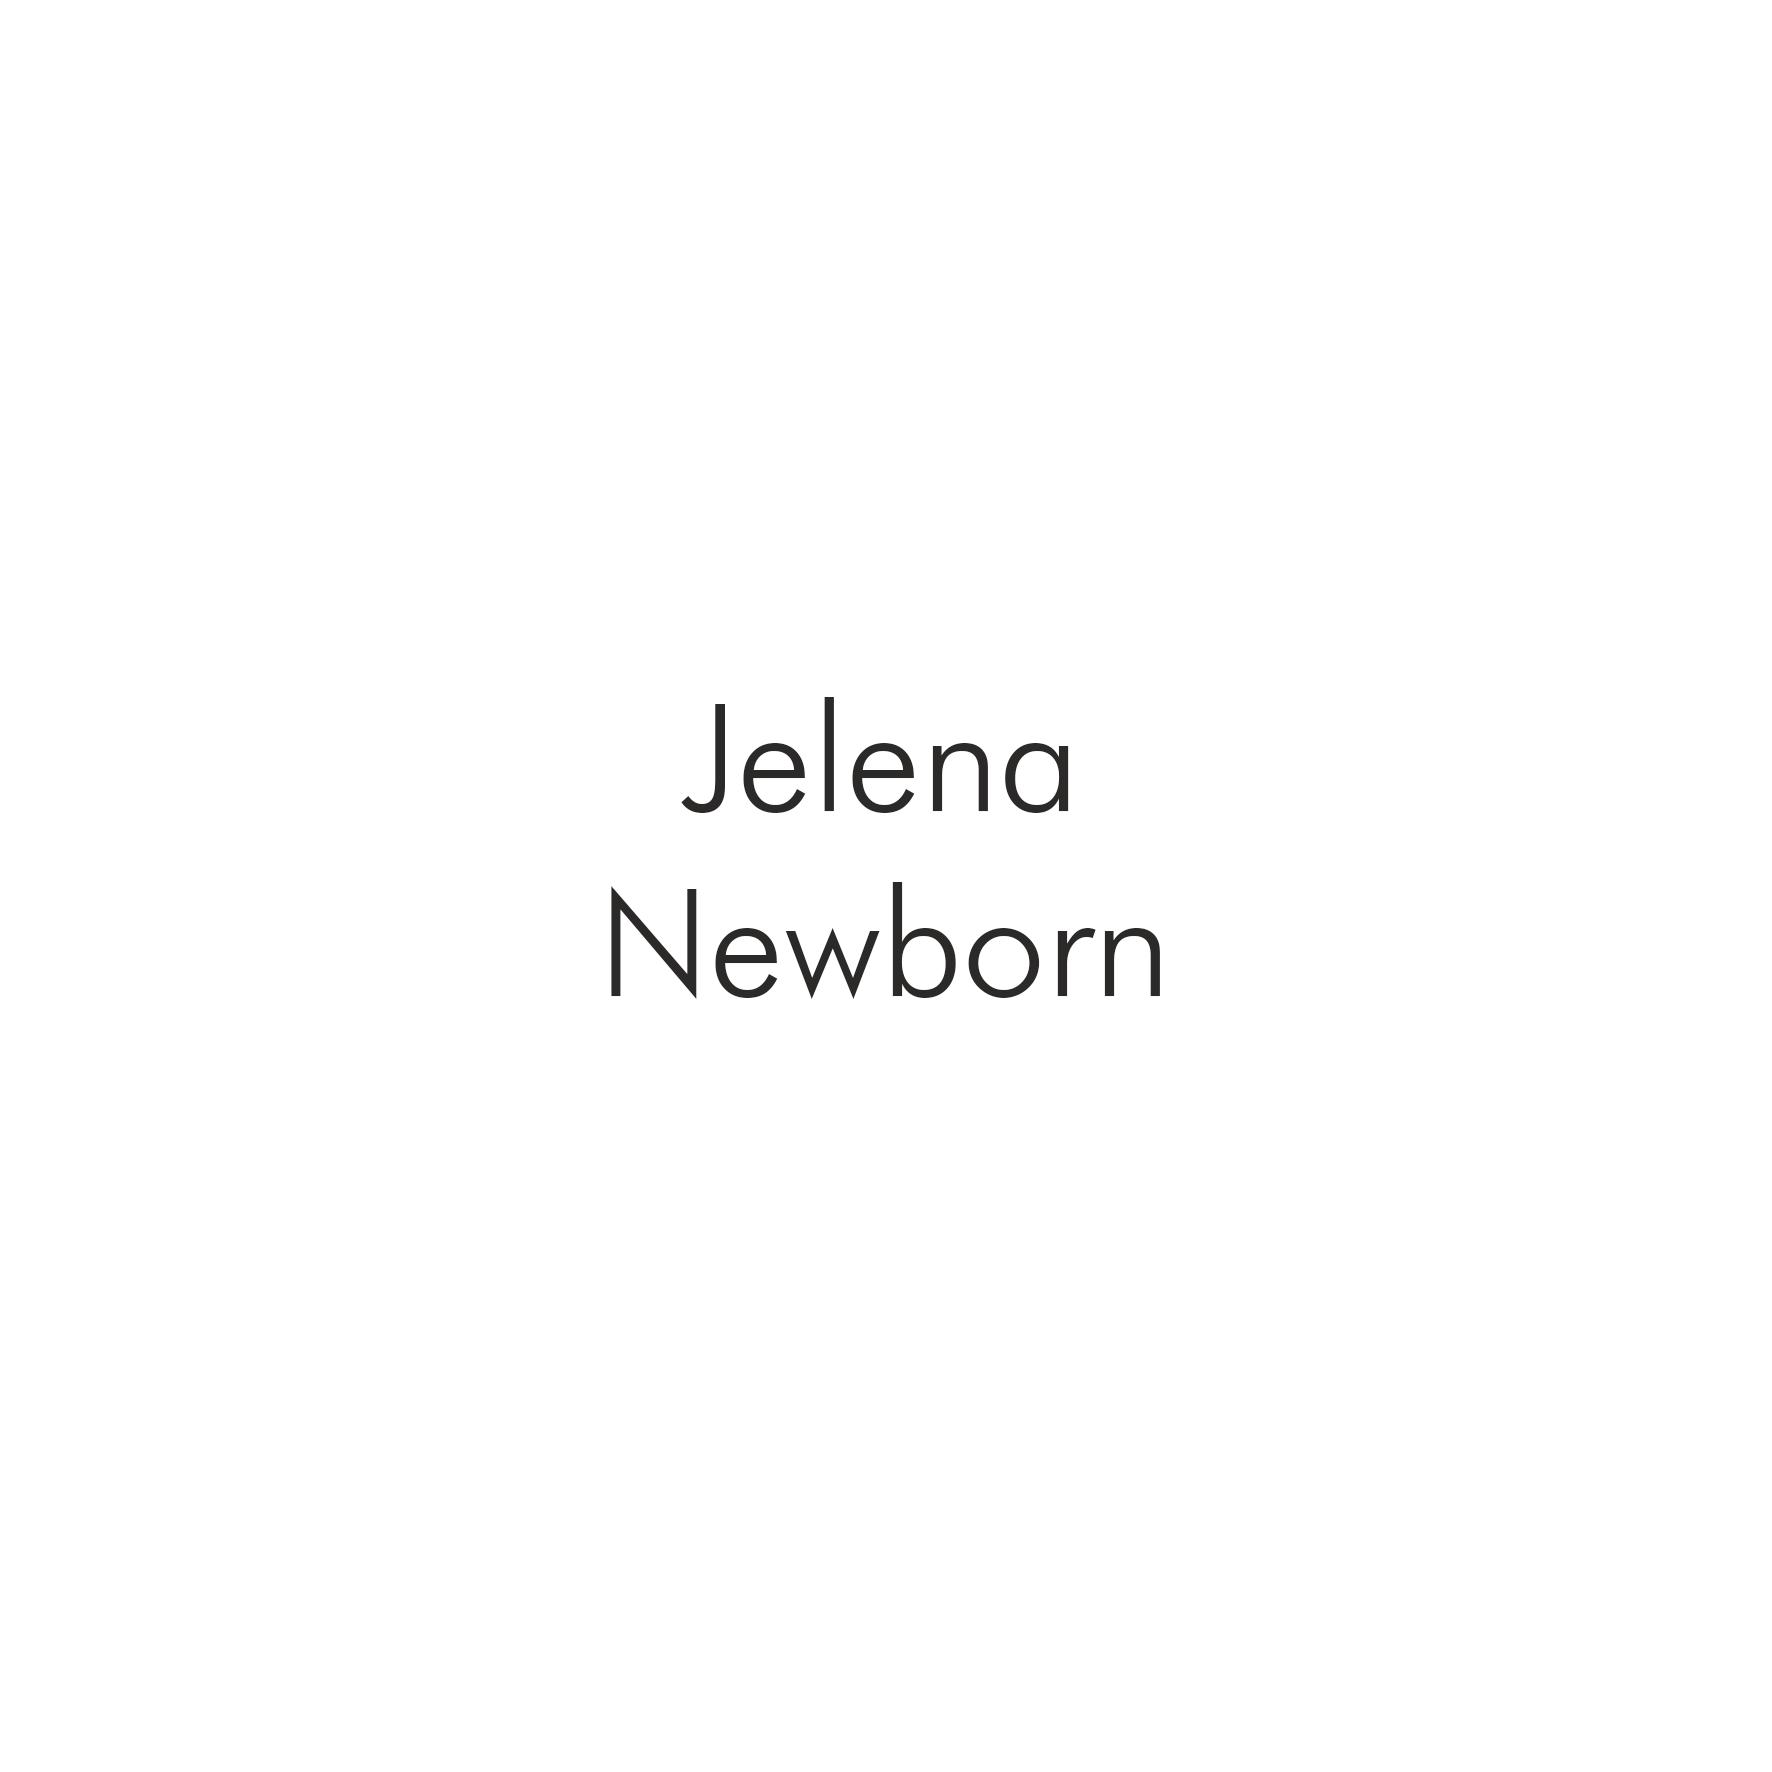 Jelena Newborn.png